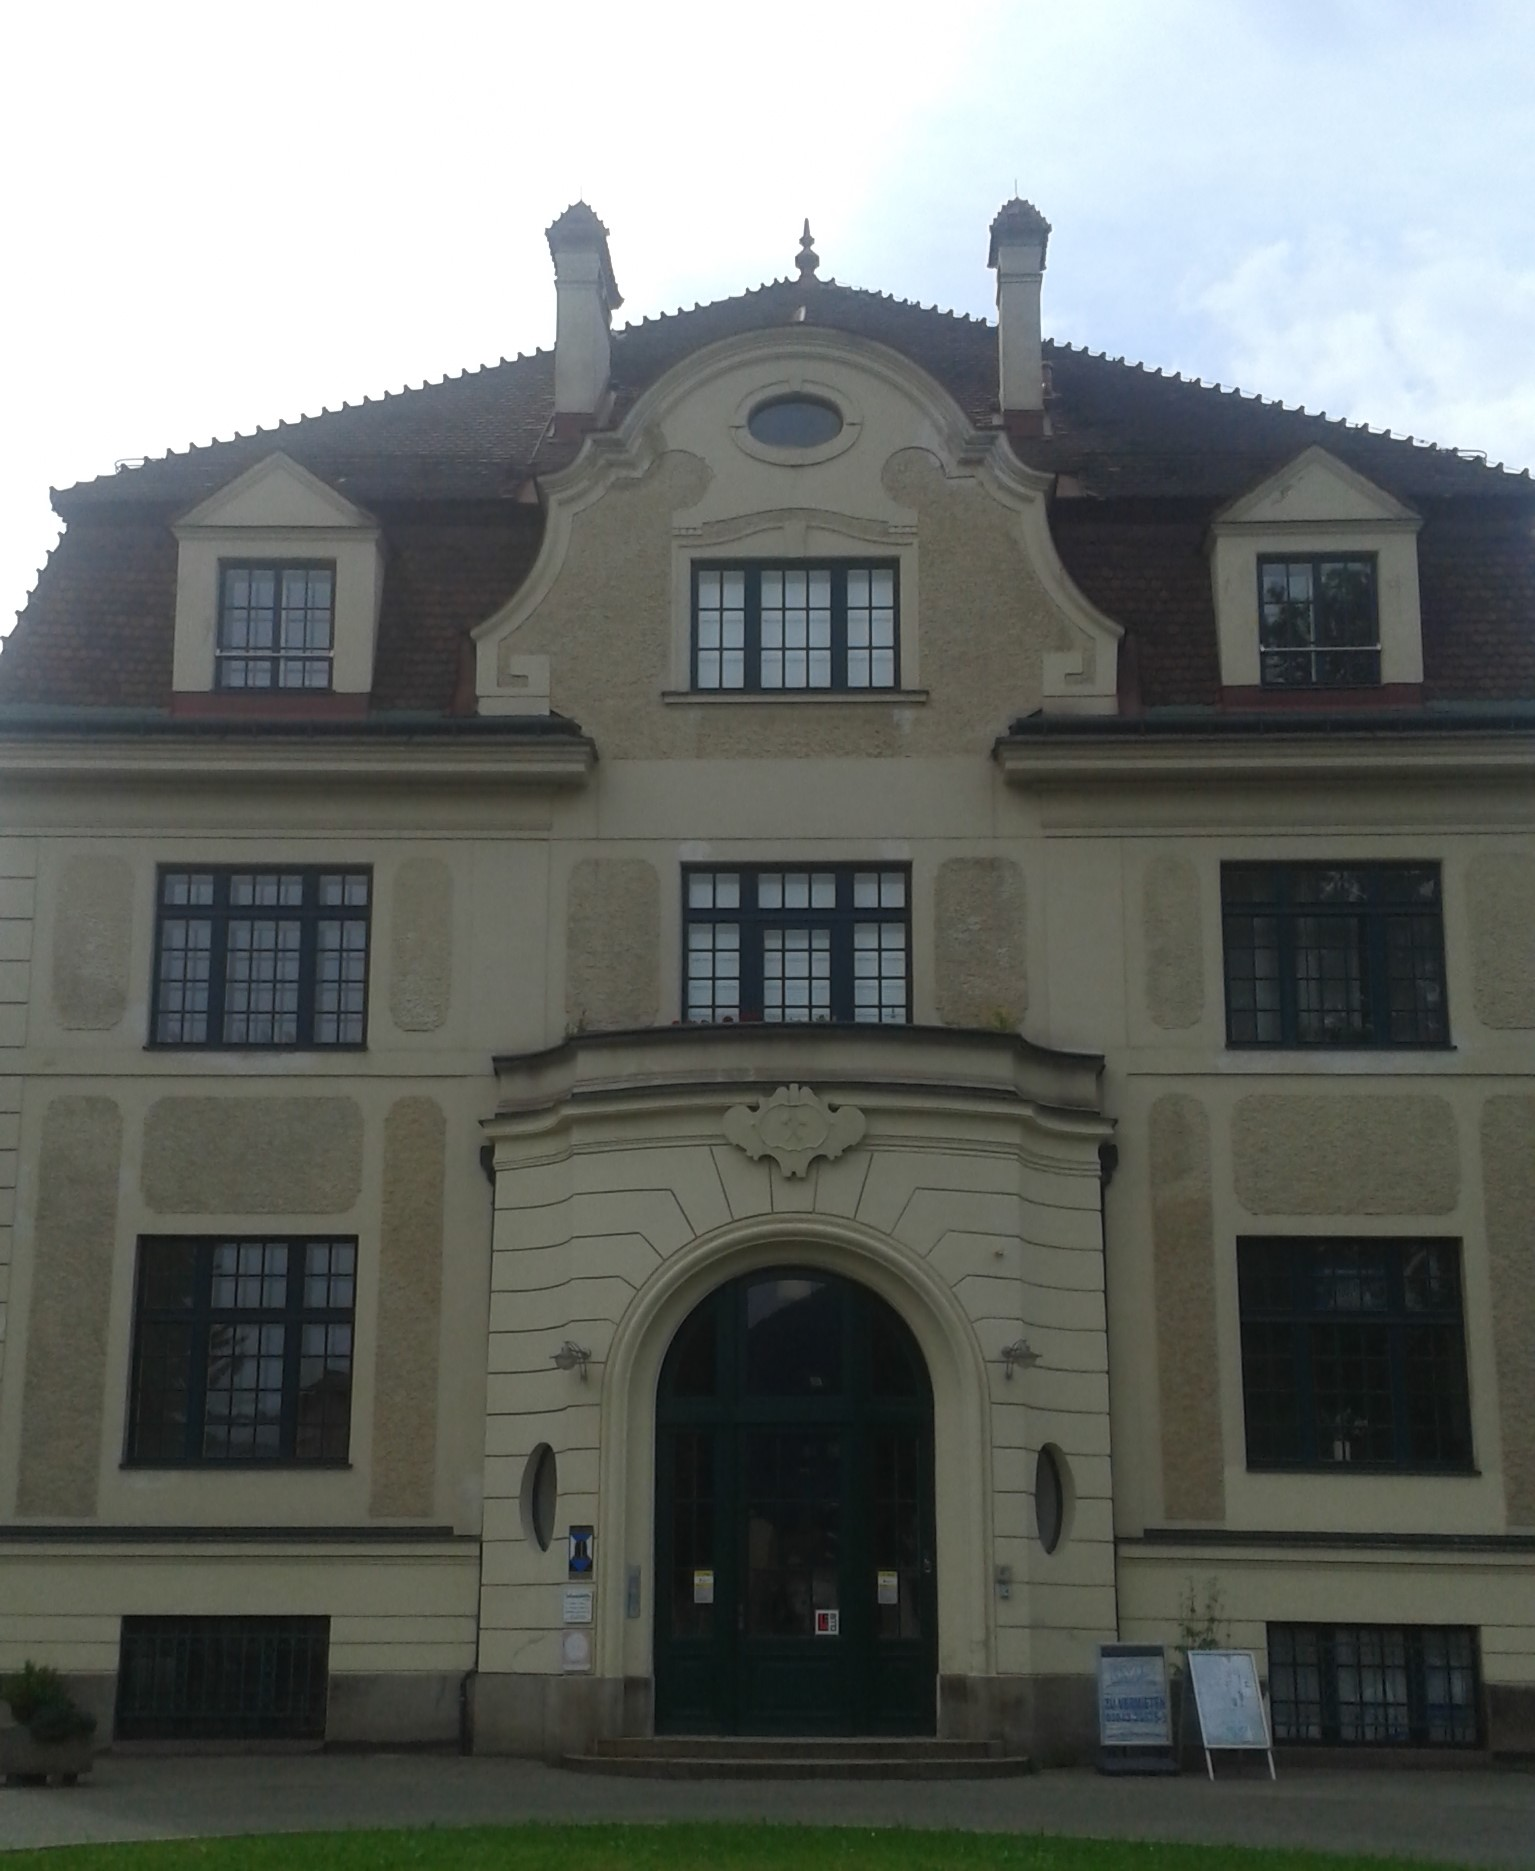 Lebenshilfe Leoben Trainingswohnung, Pestalozzistraße 92, 8700, Austria